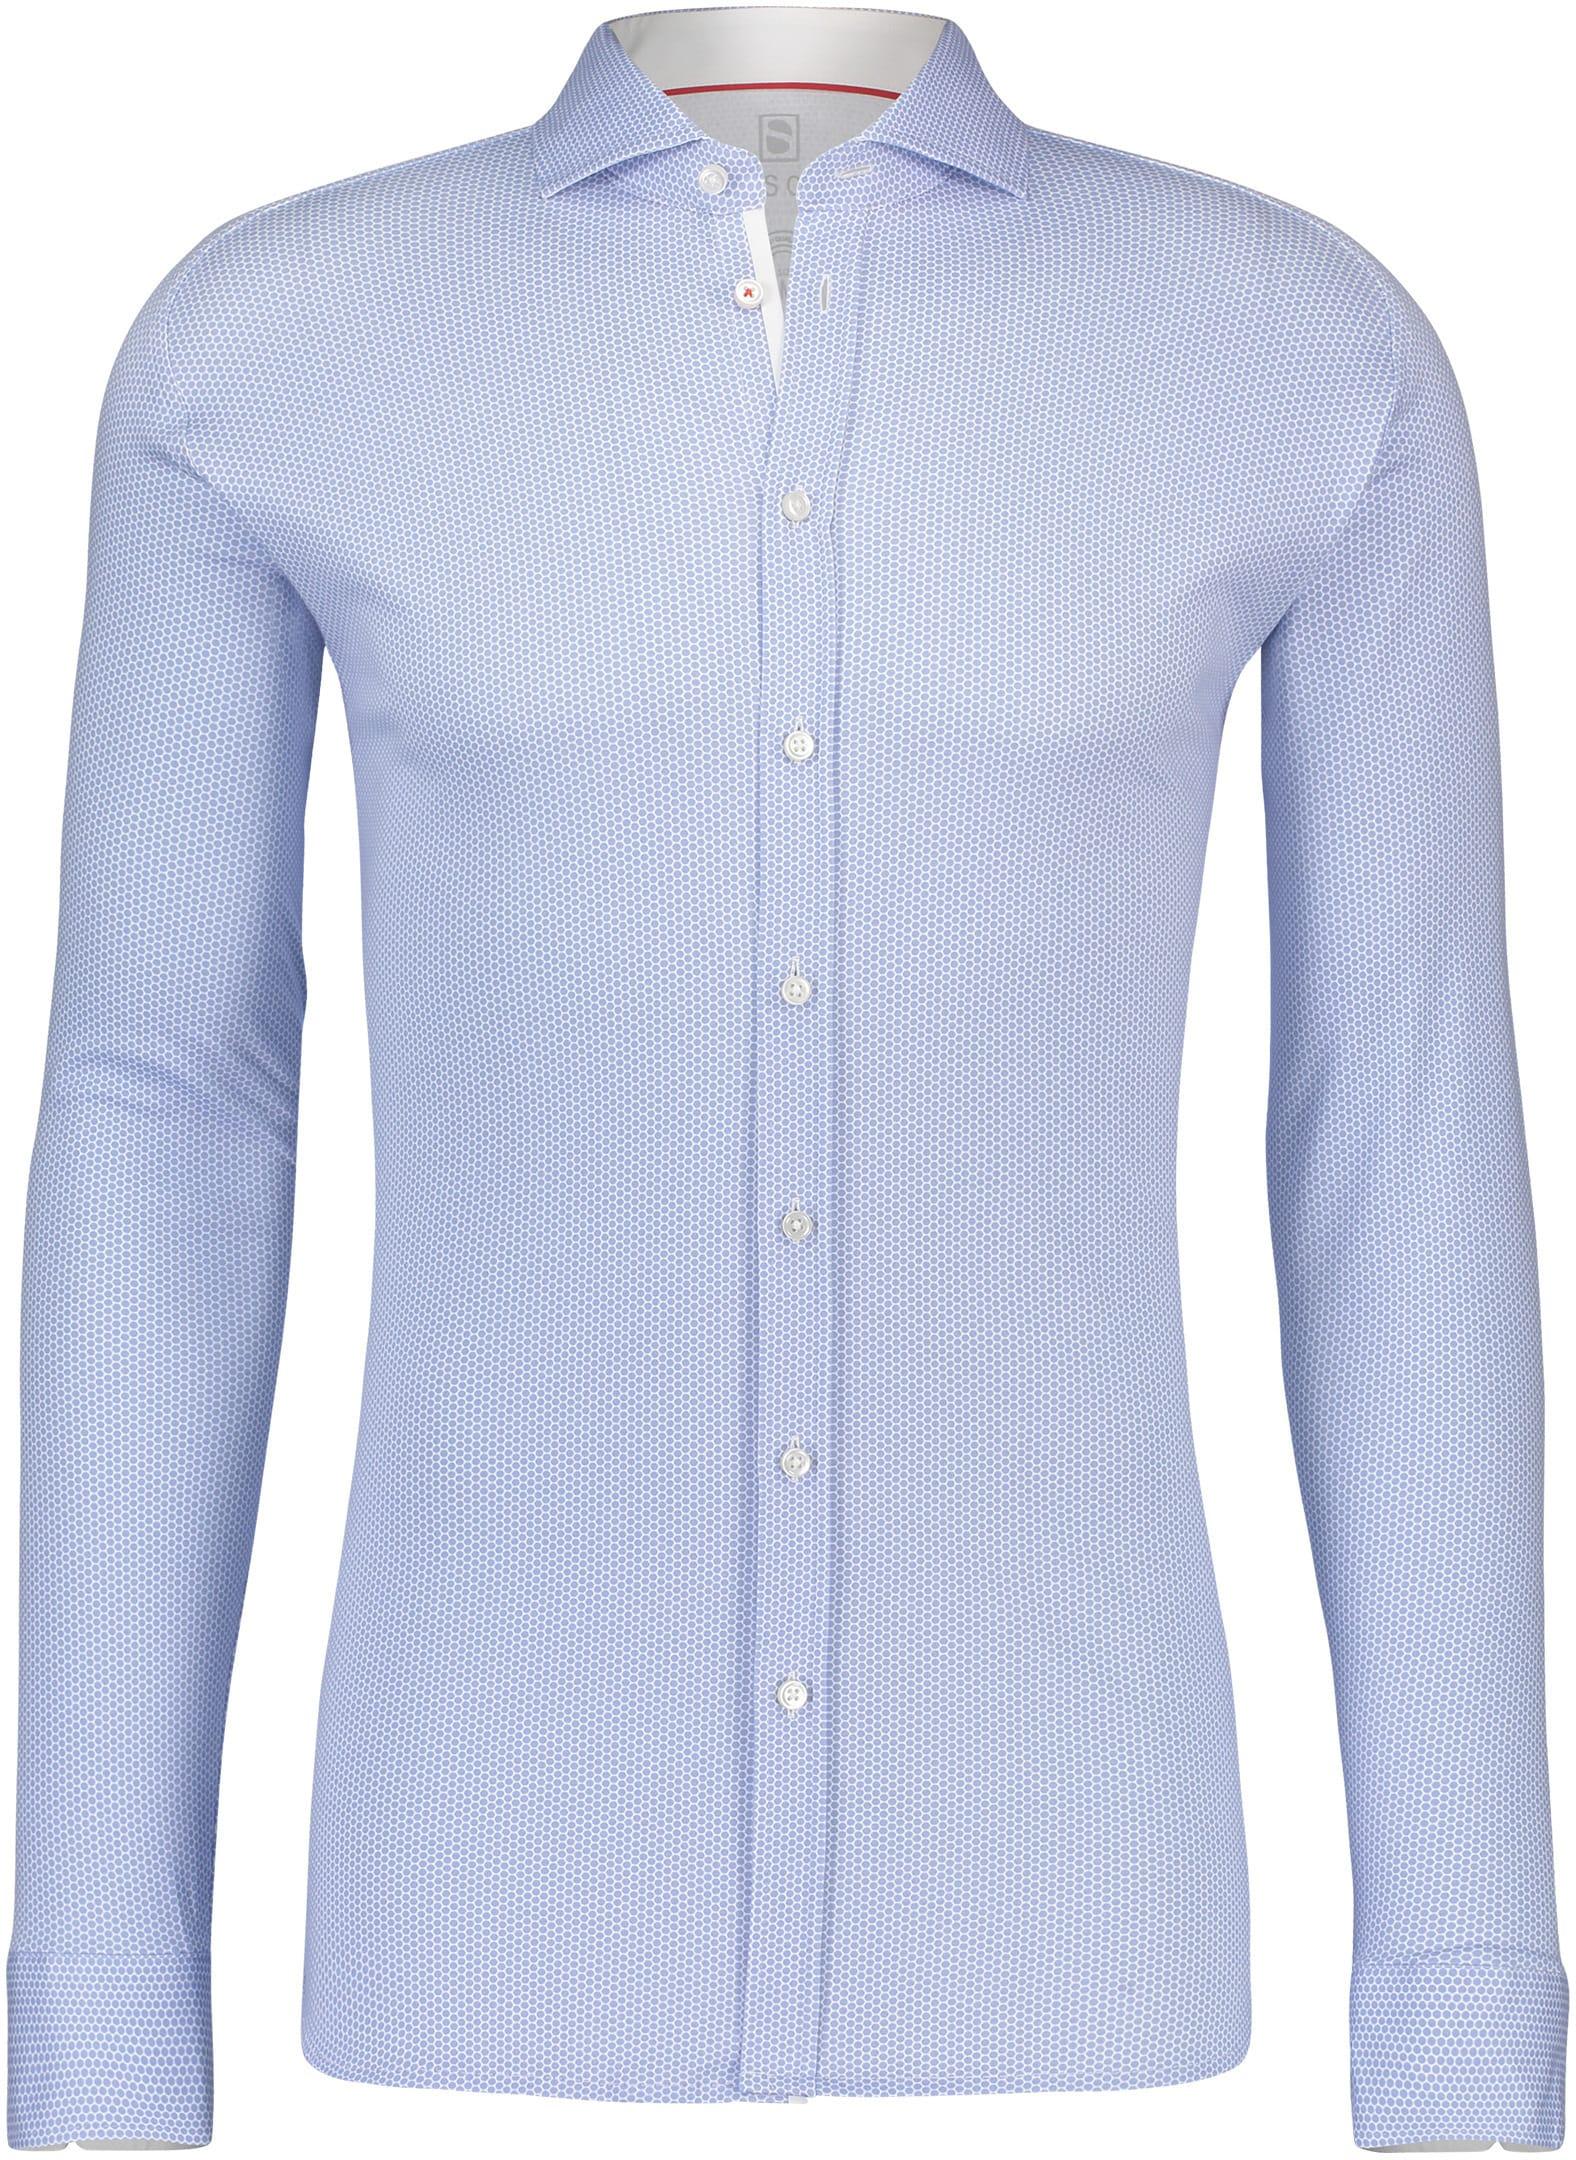 Desoto Overhemd Strijkvrij Stippen Blauw foto 0